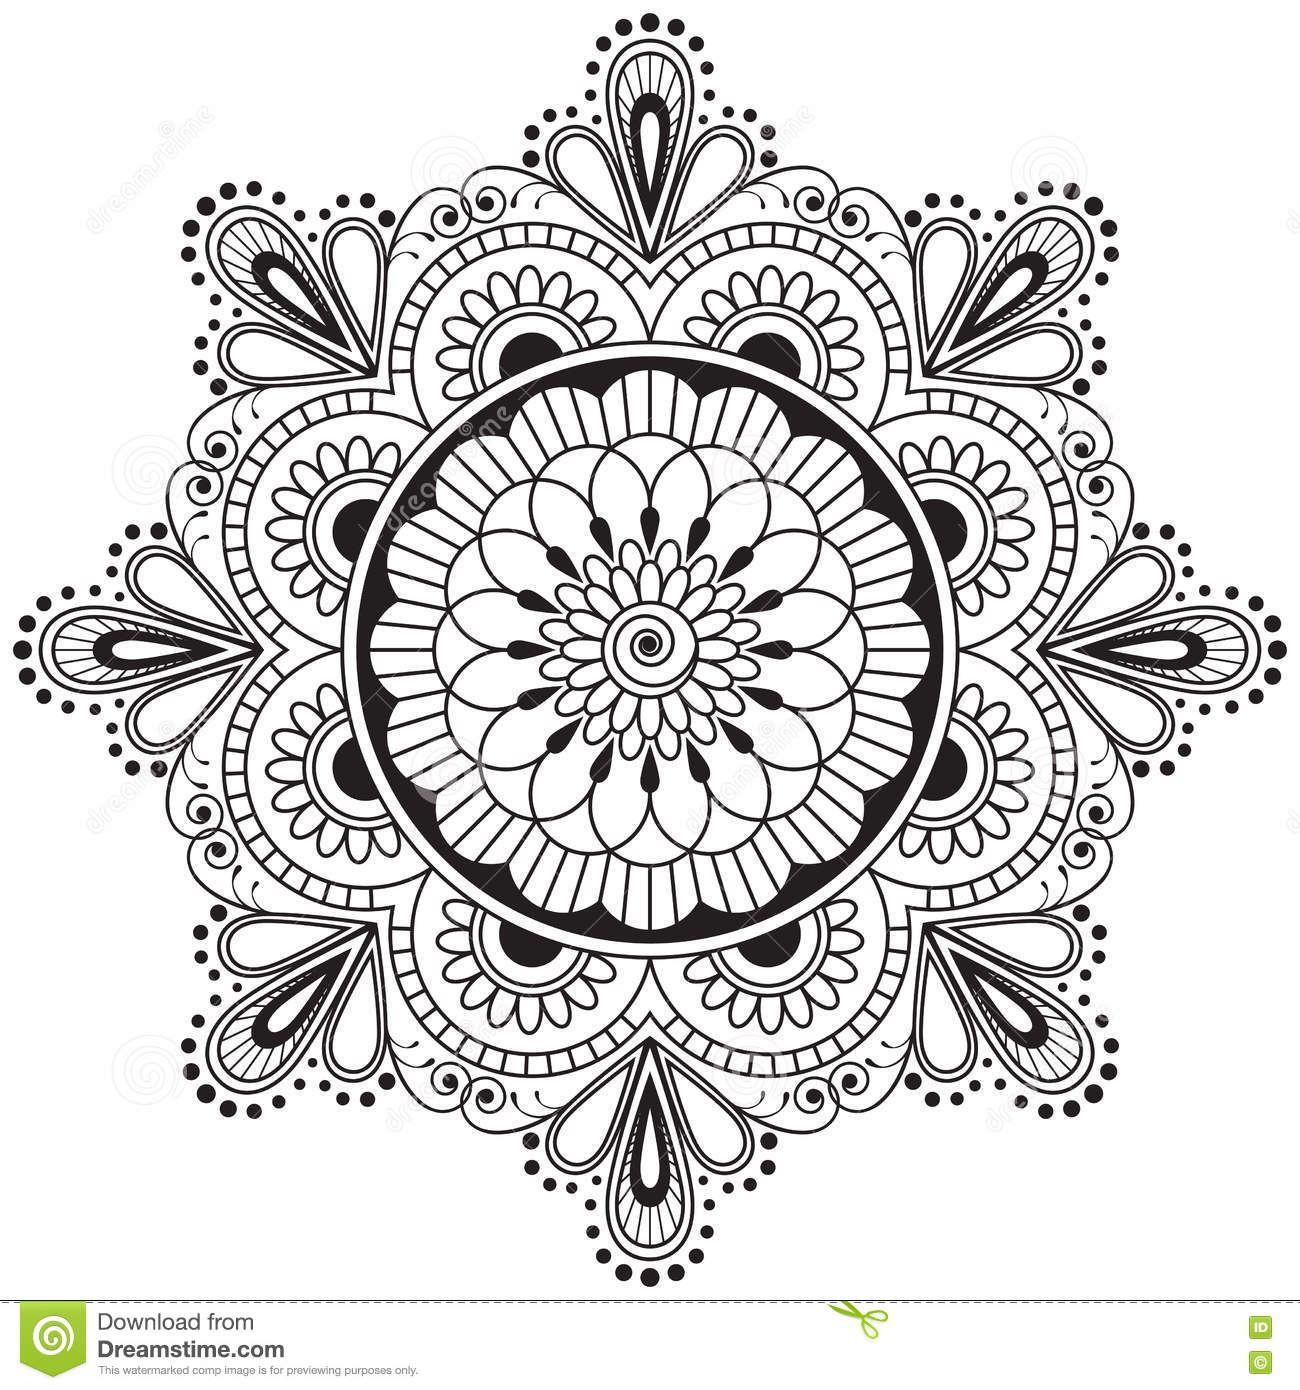 Mandala Henna Designs: Mandala Coloring Pages, Mandala Drawing, Mandala